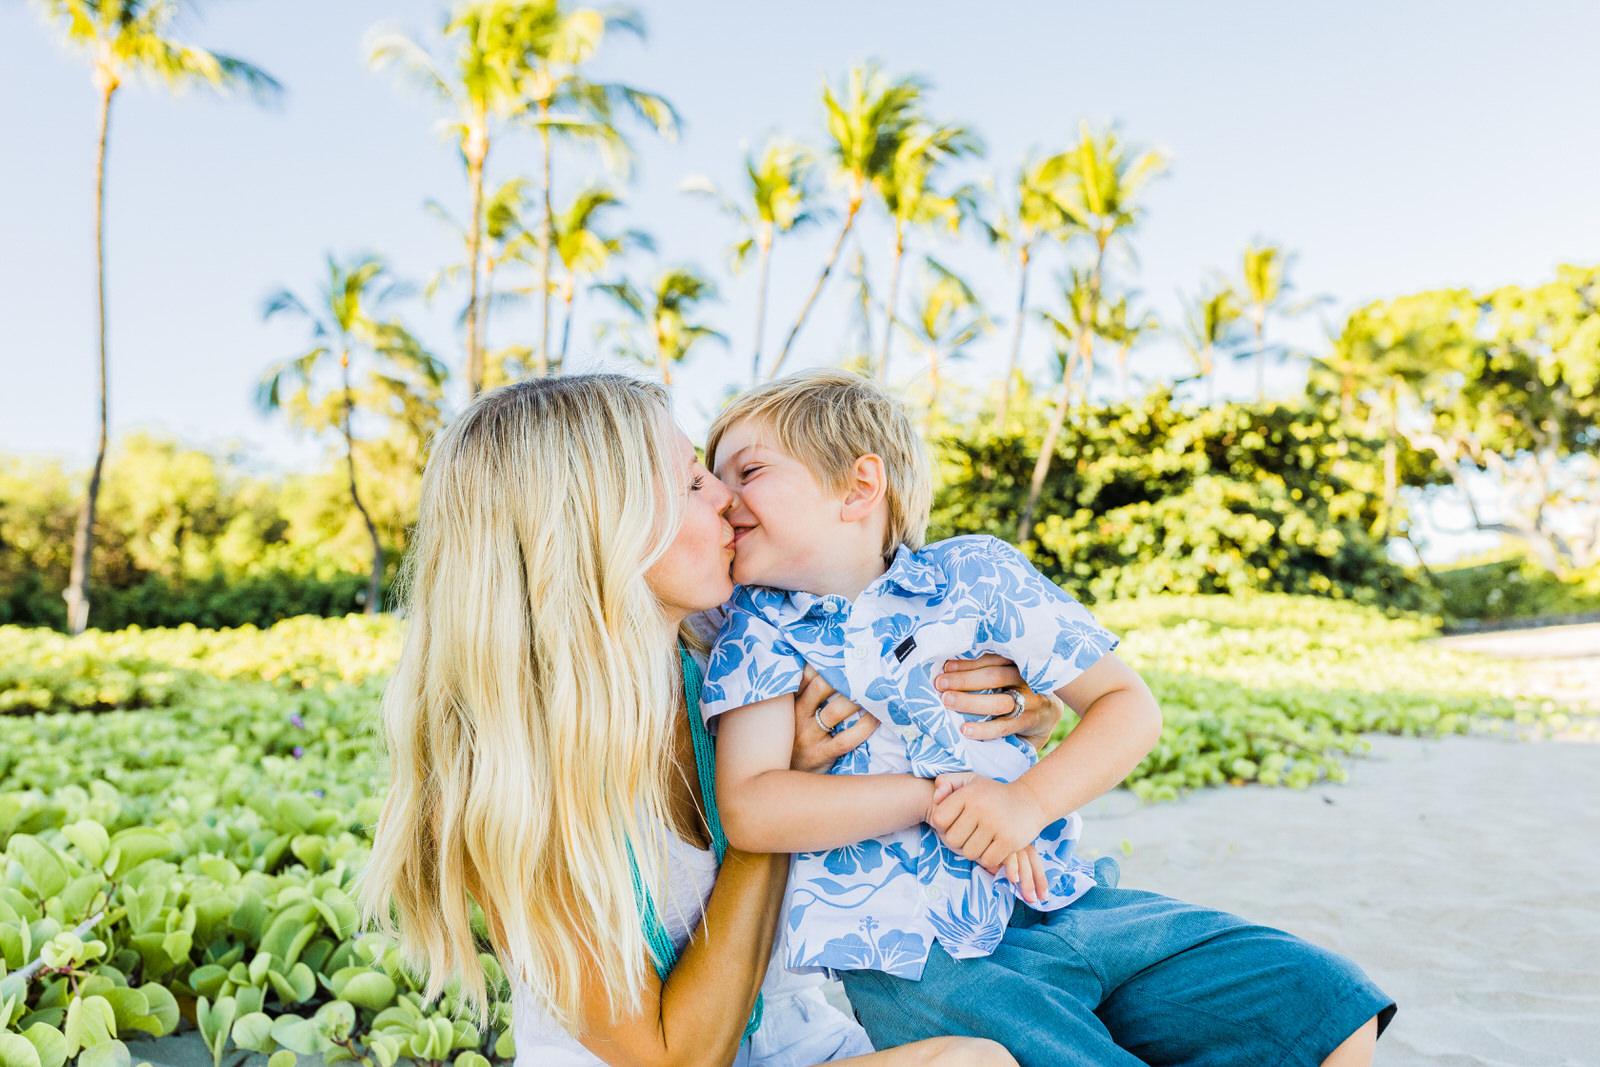 big-island-photographer-family-session-mauna-kea-resort-summer-waikoloa-sunrise-4038.jpg